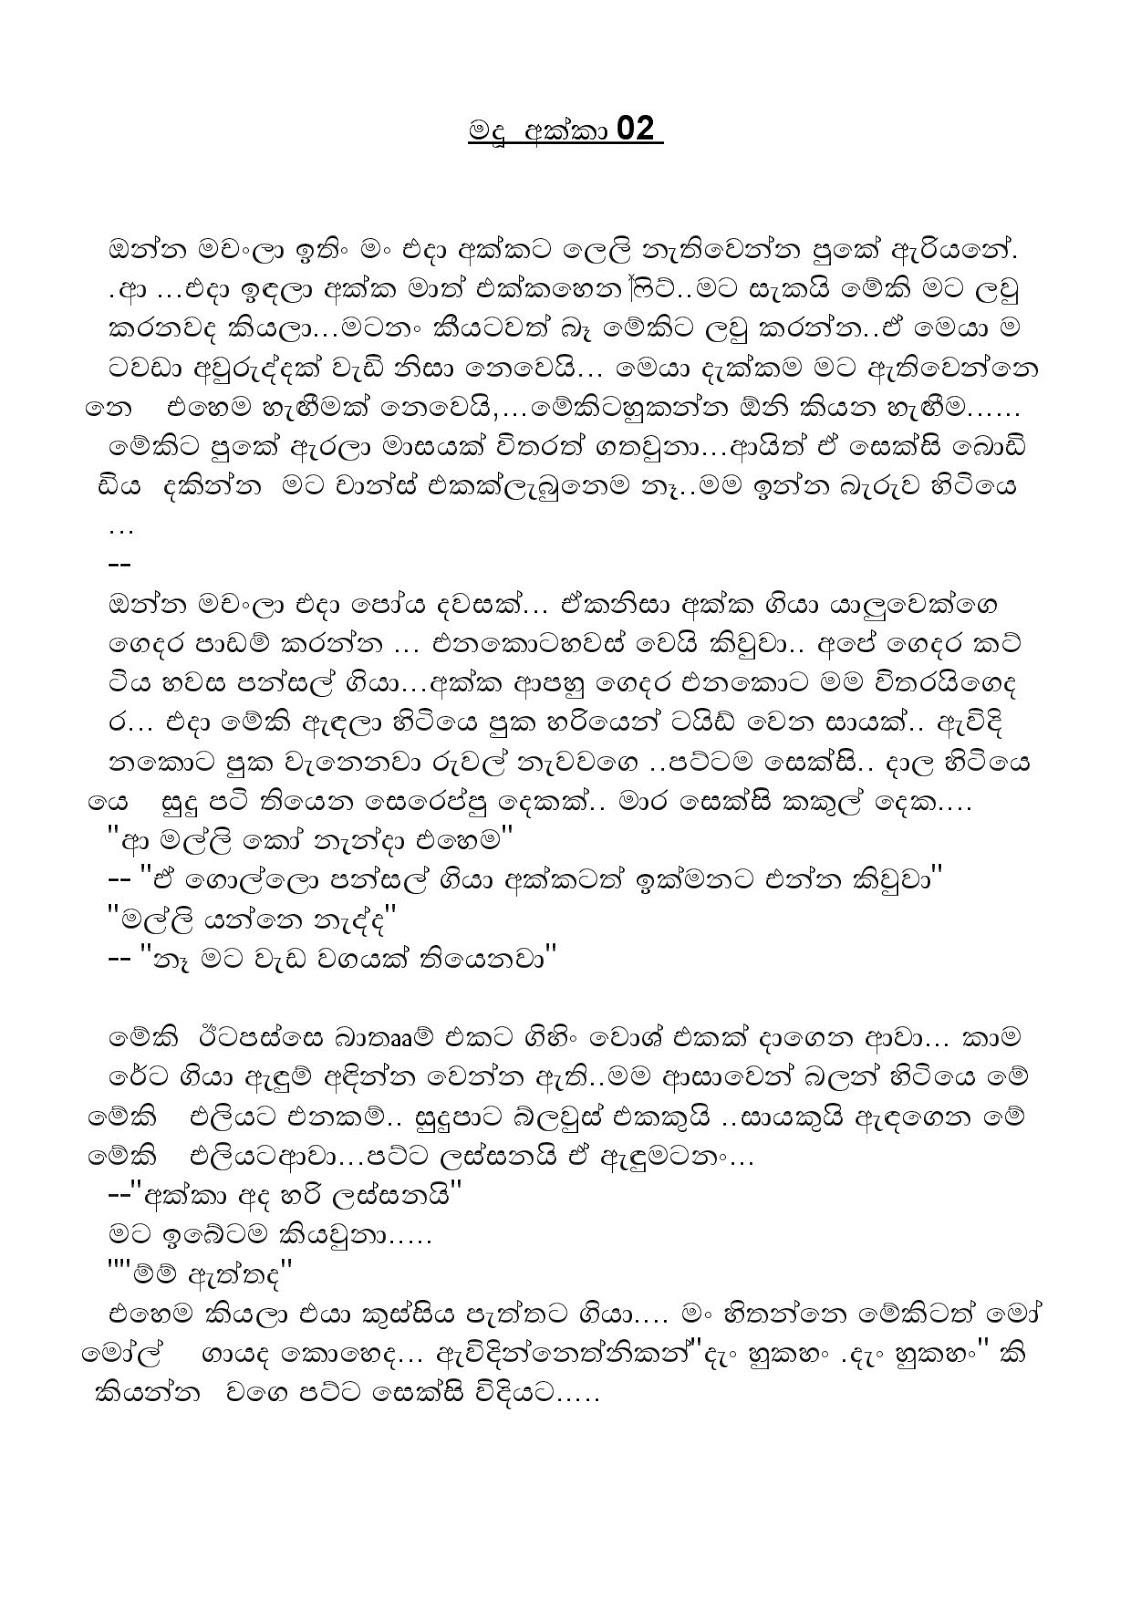 Madhu Akkata Hukapu Kathwa 2 - Sinhala Wal Katha